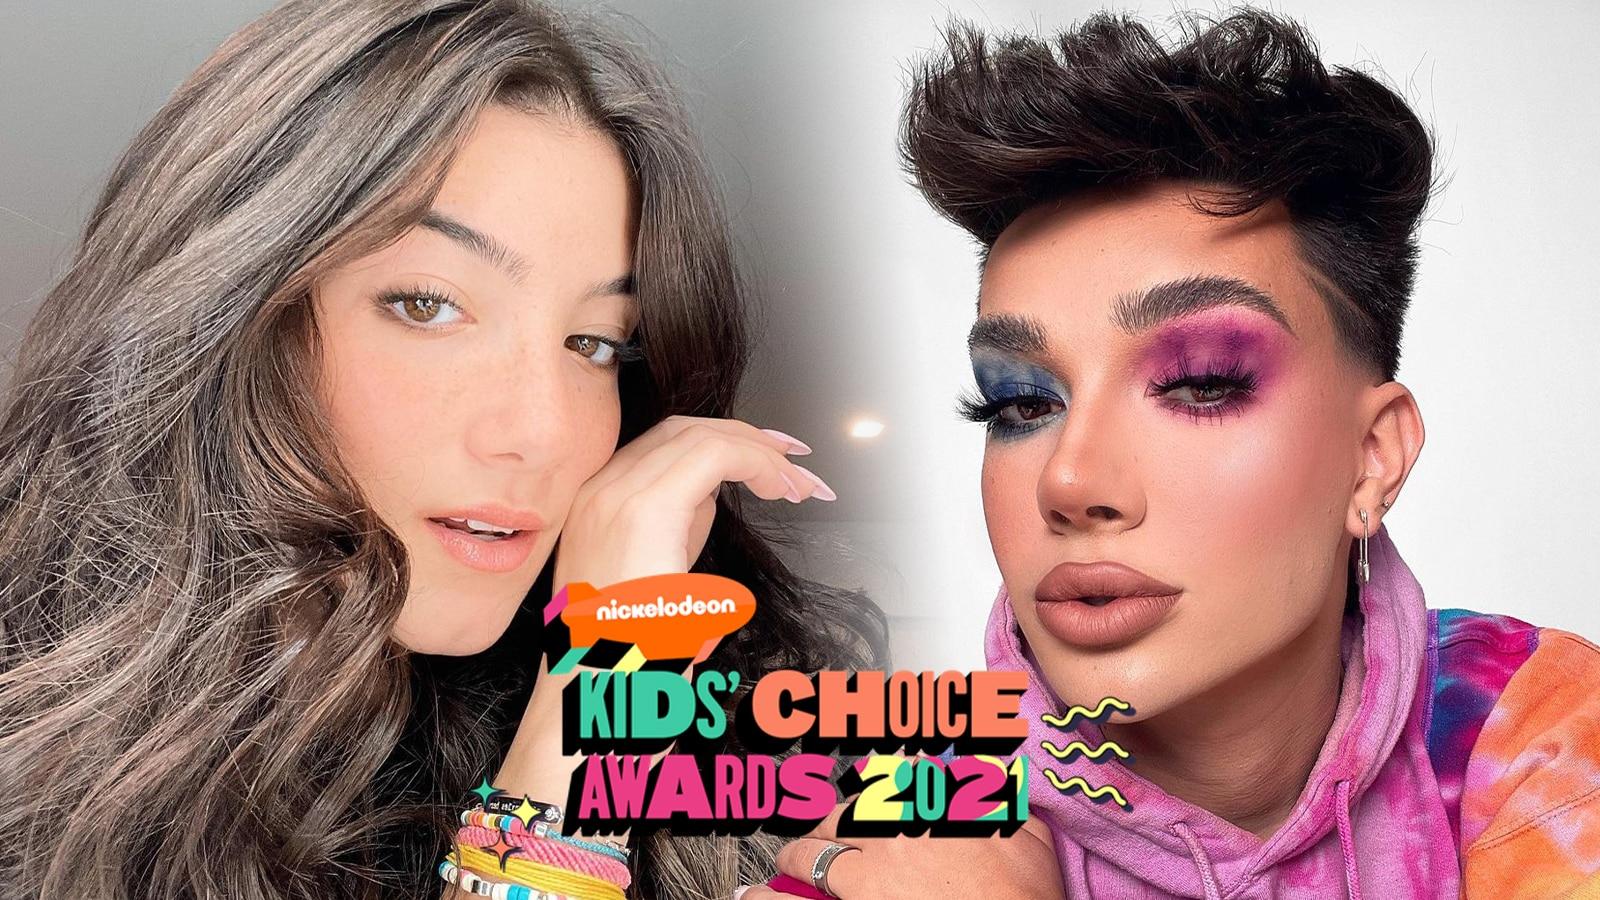 Charli D'Amelio and James Charles winning Kids Choice Awards 2021